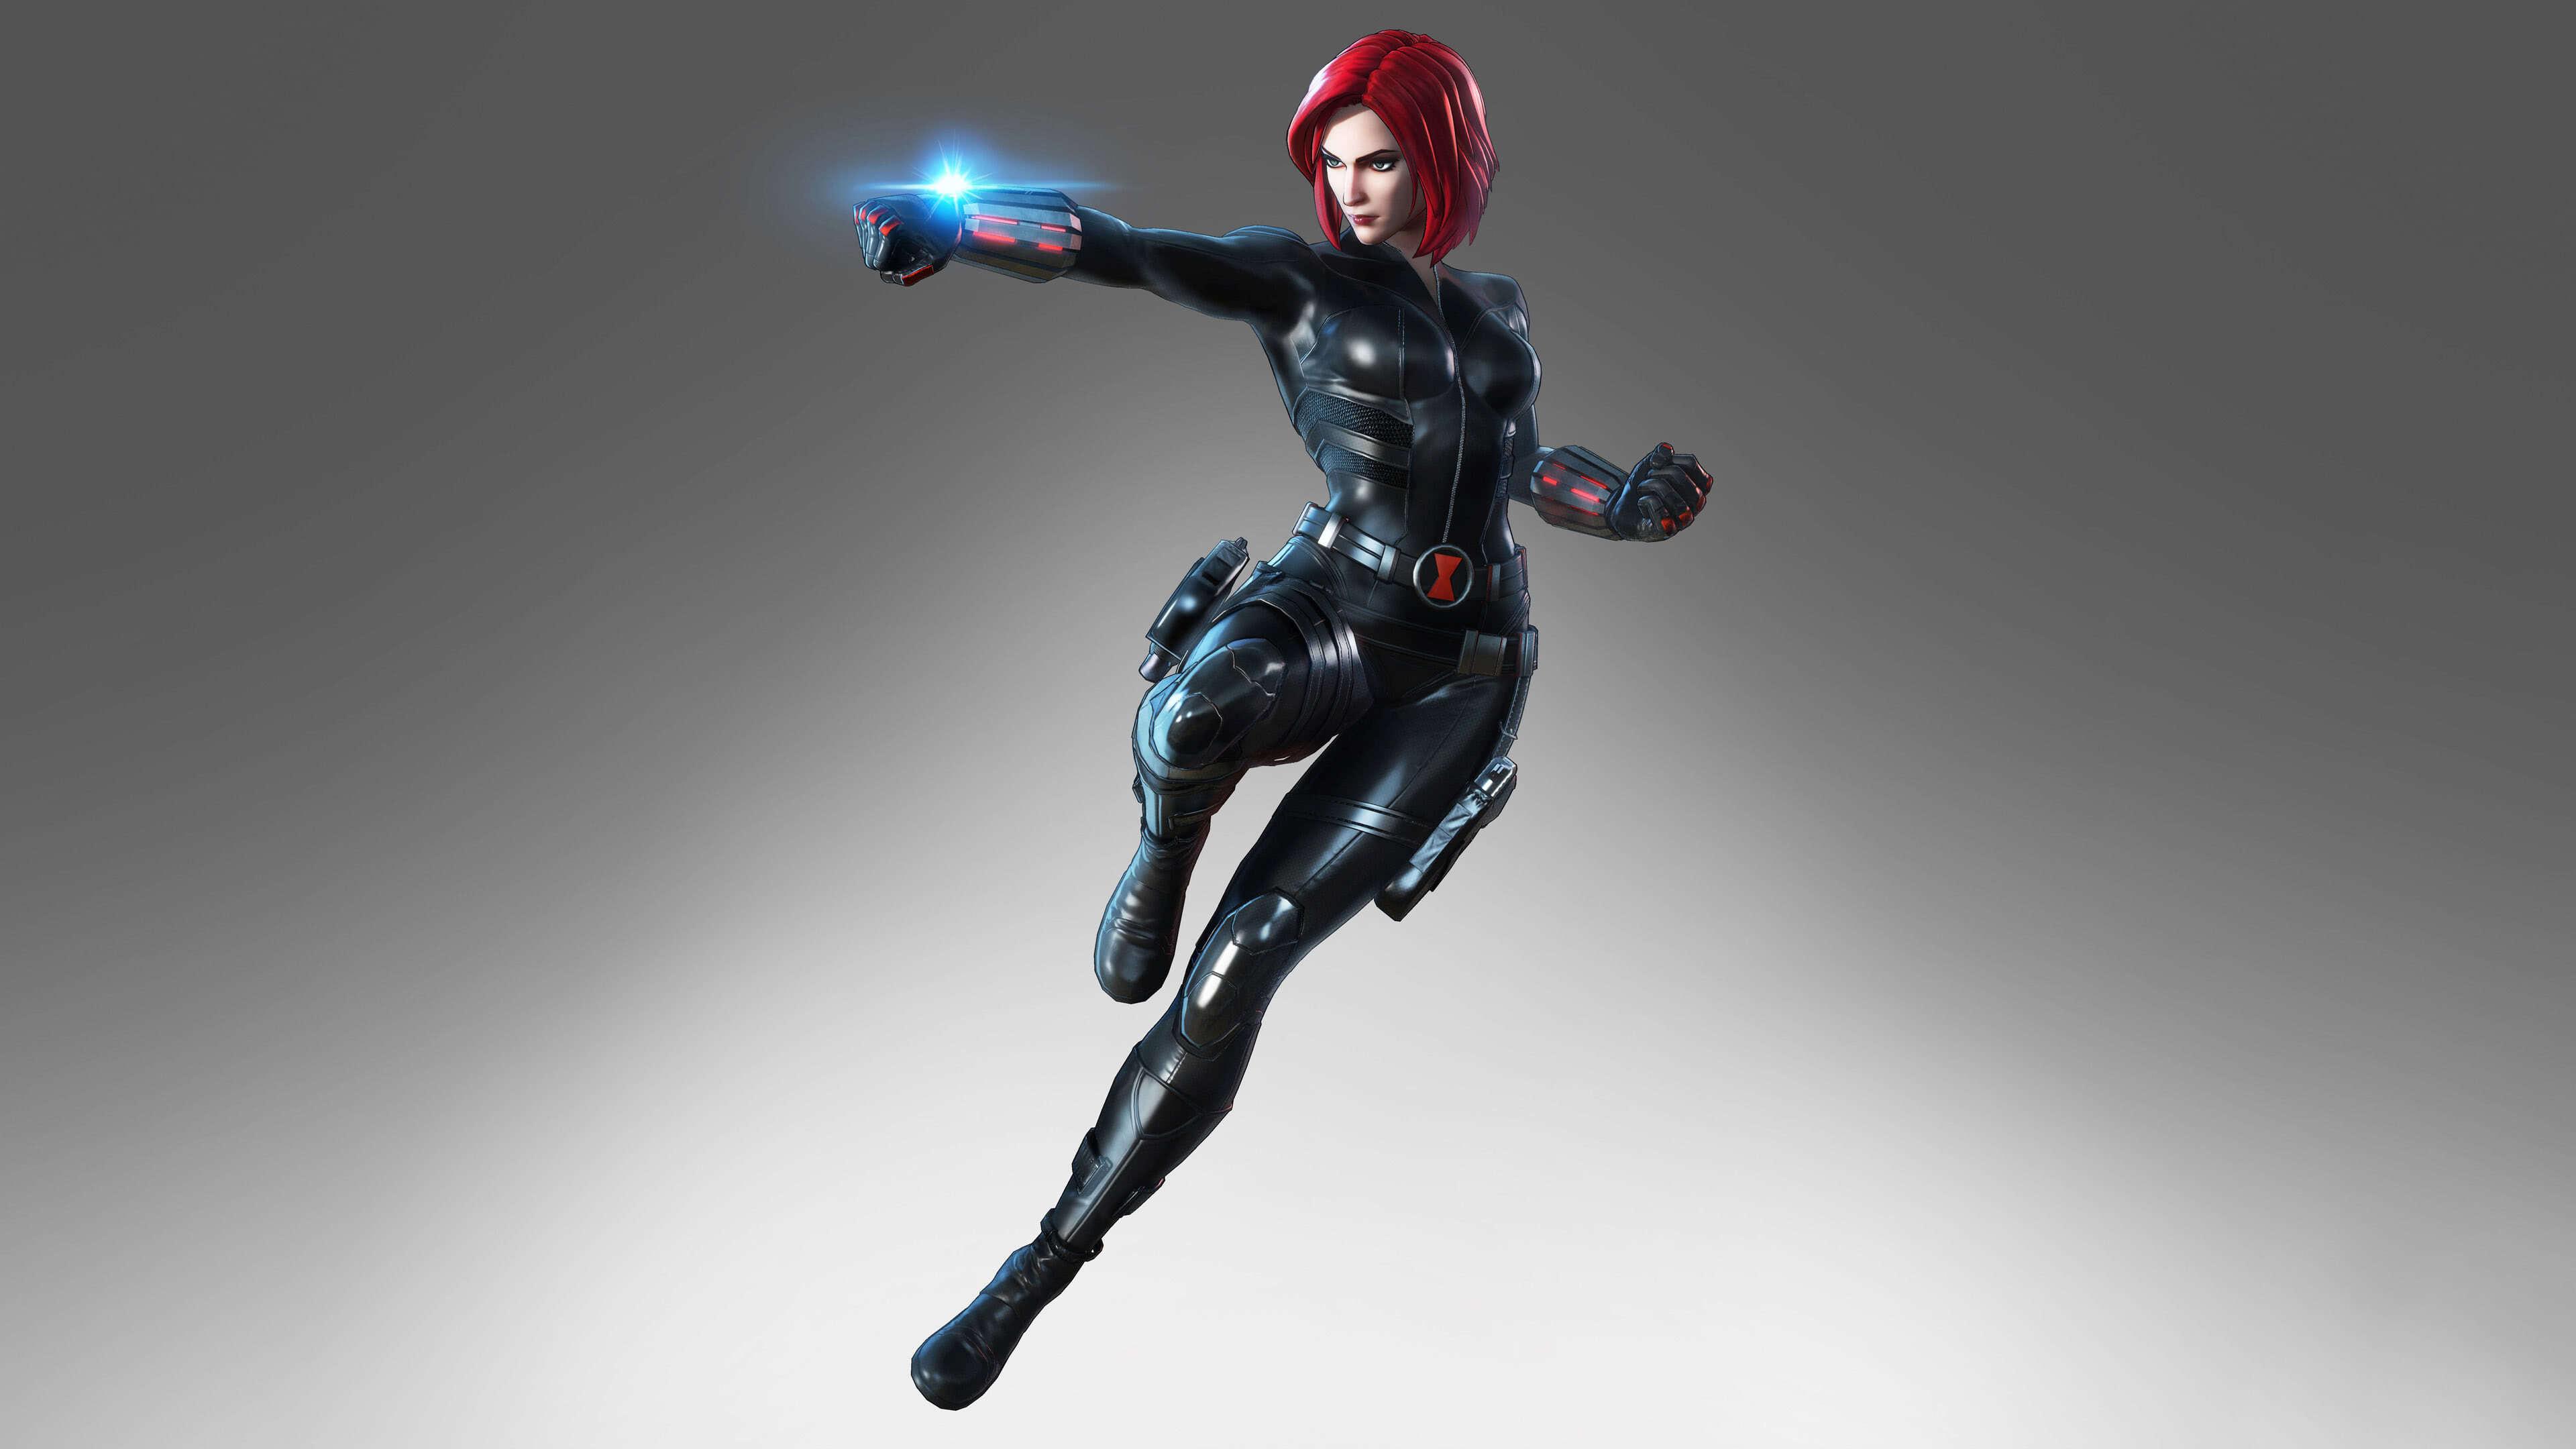 Marvel Ultimate Alliance 3 Black Widow Uhd 4k Wallpaper Pixelz